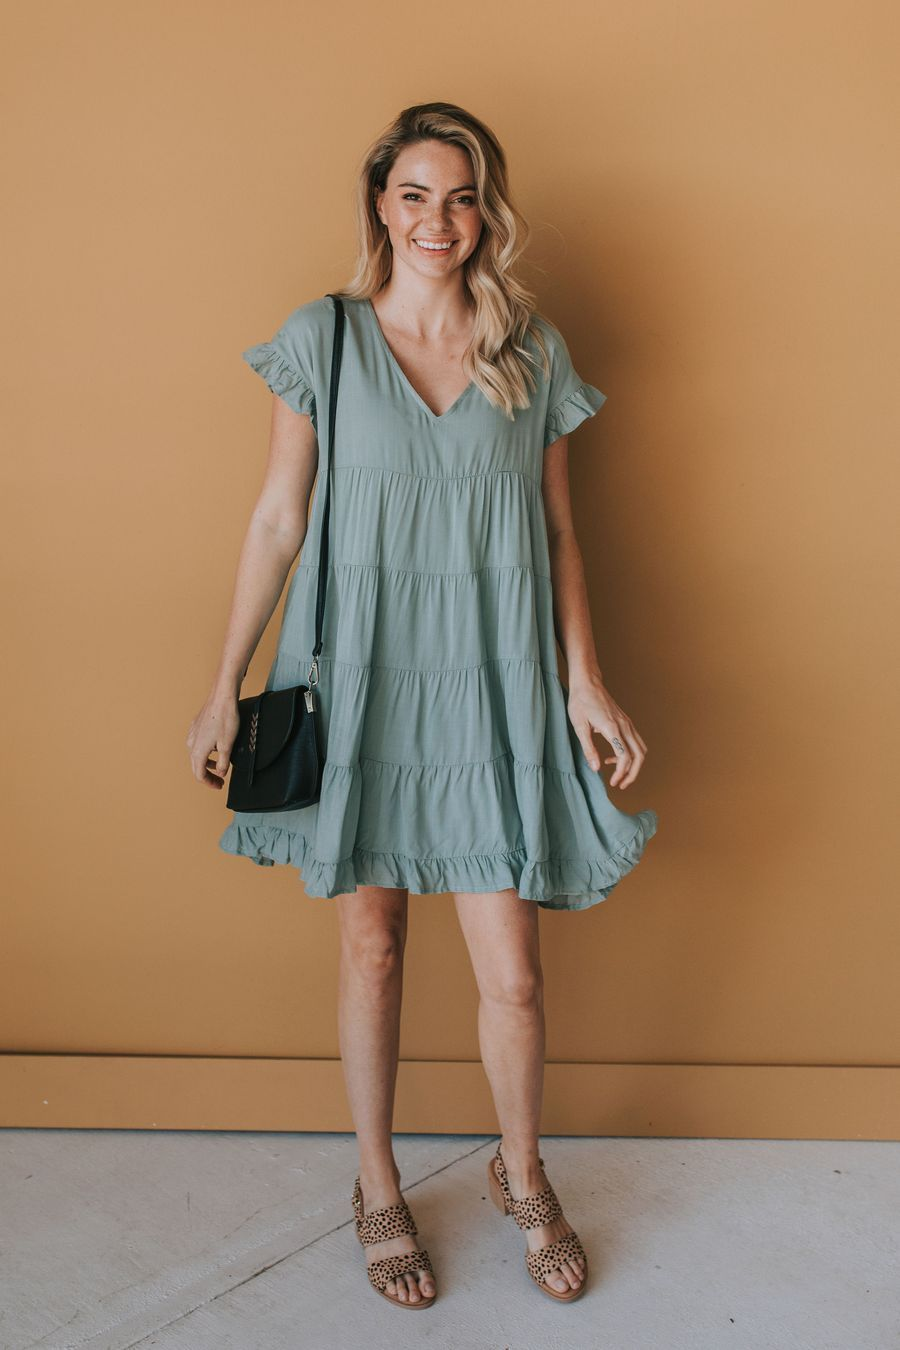 Pin By Fashionista Den On S U M M E R L O V I N Joy Dress Cute Church Outfits Modest Fashion Outfits [ 1350 x 900 Pixel ]